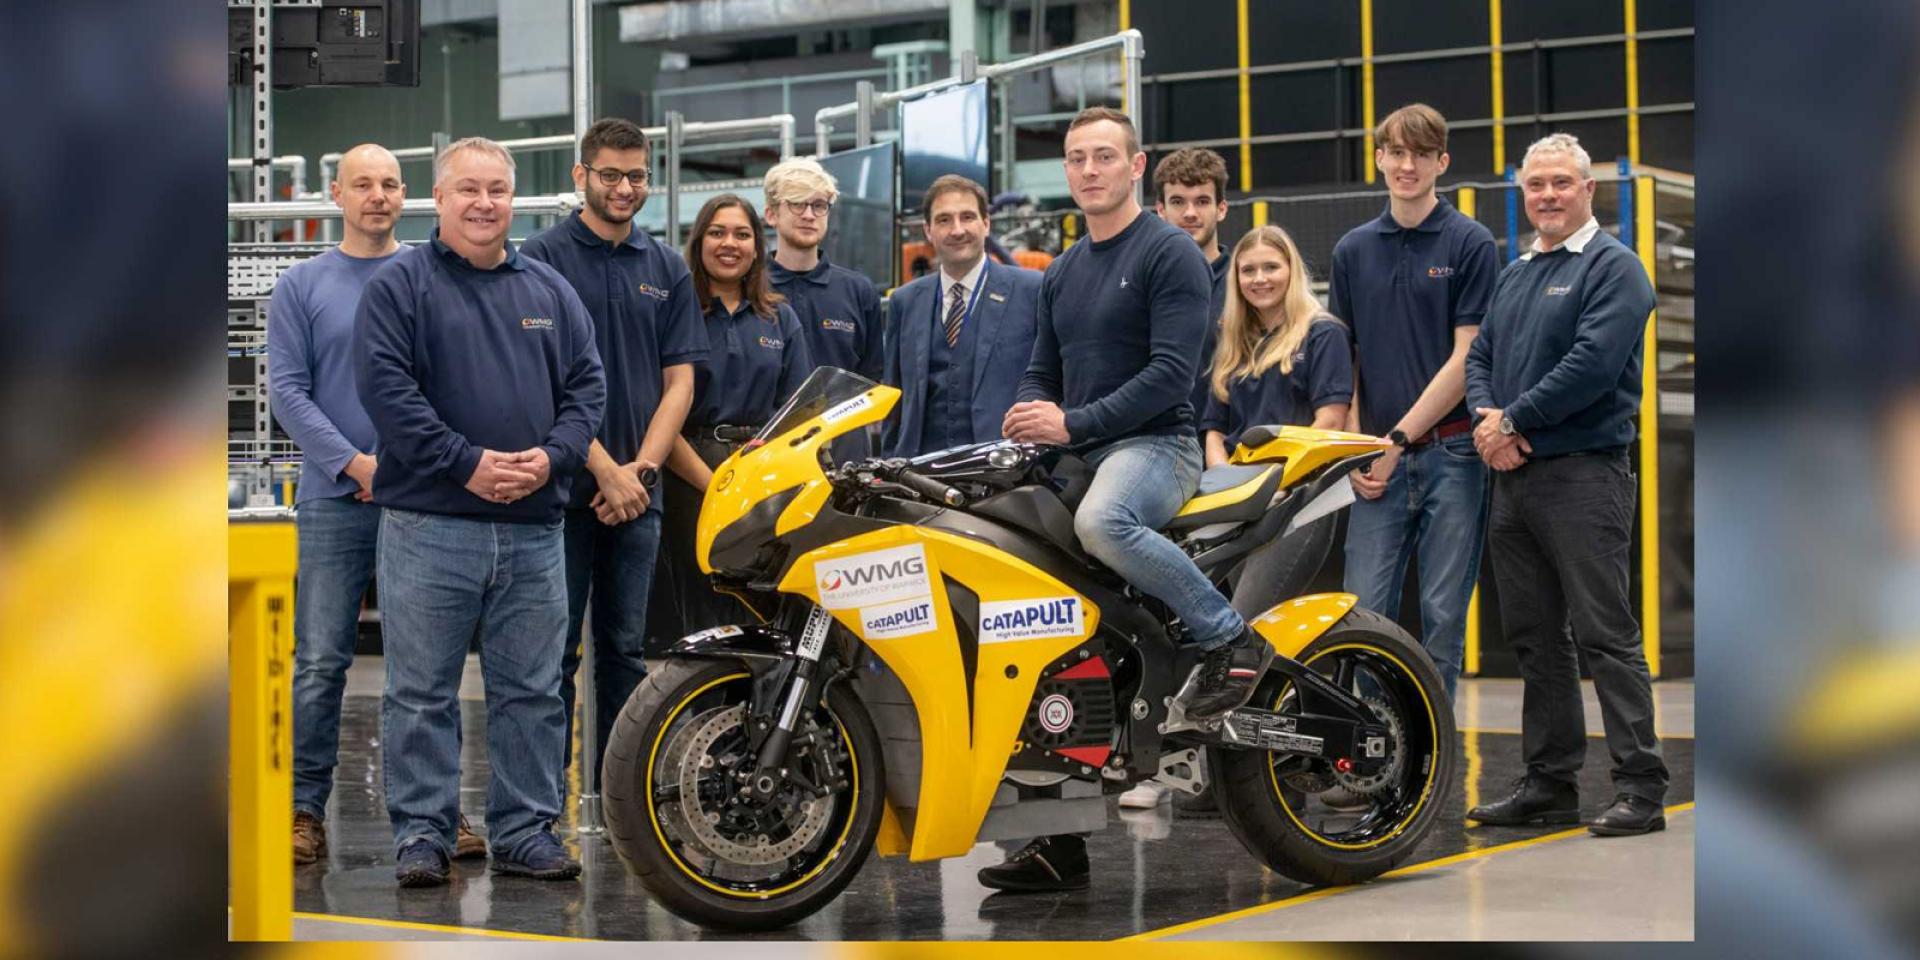 FireBlade電動車!Warwick大學學生成立Warwick Moto,準備進軍曼島TT Zero!